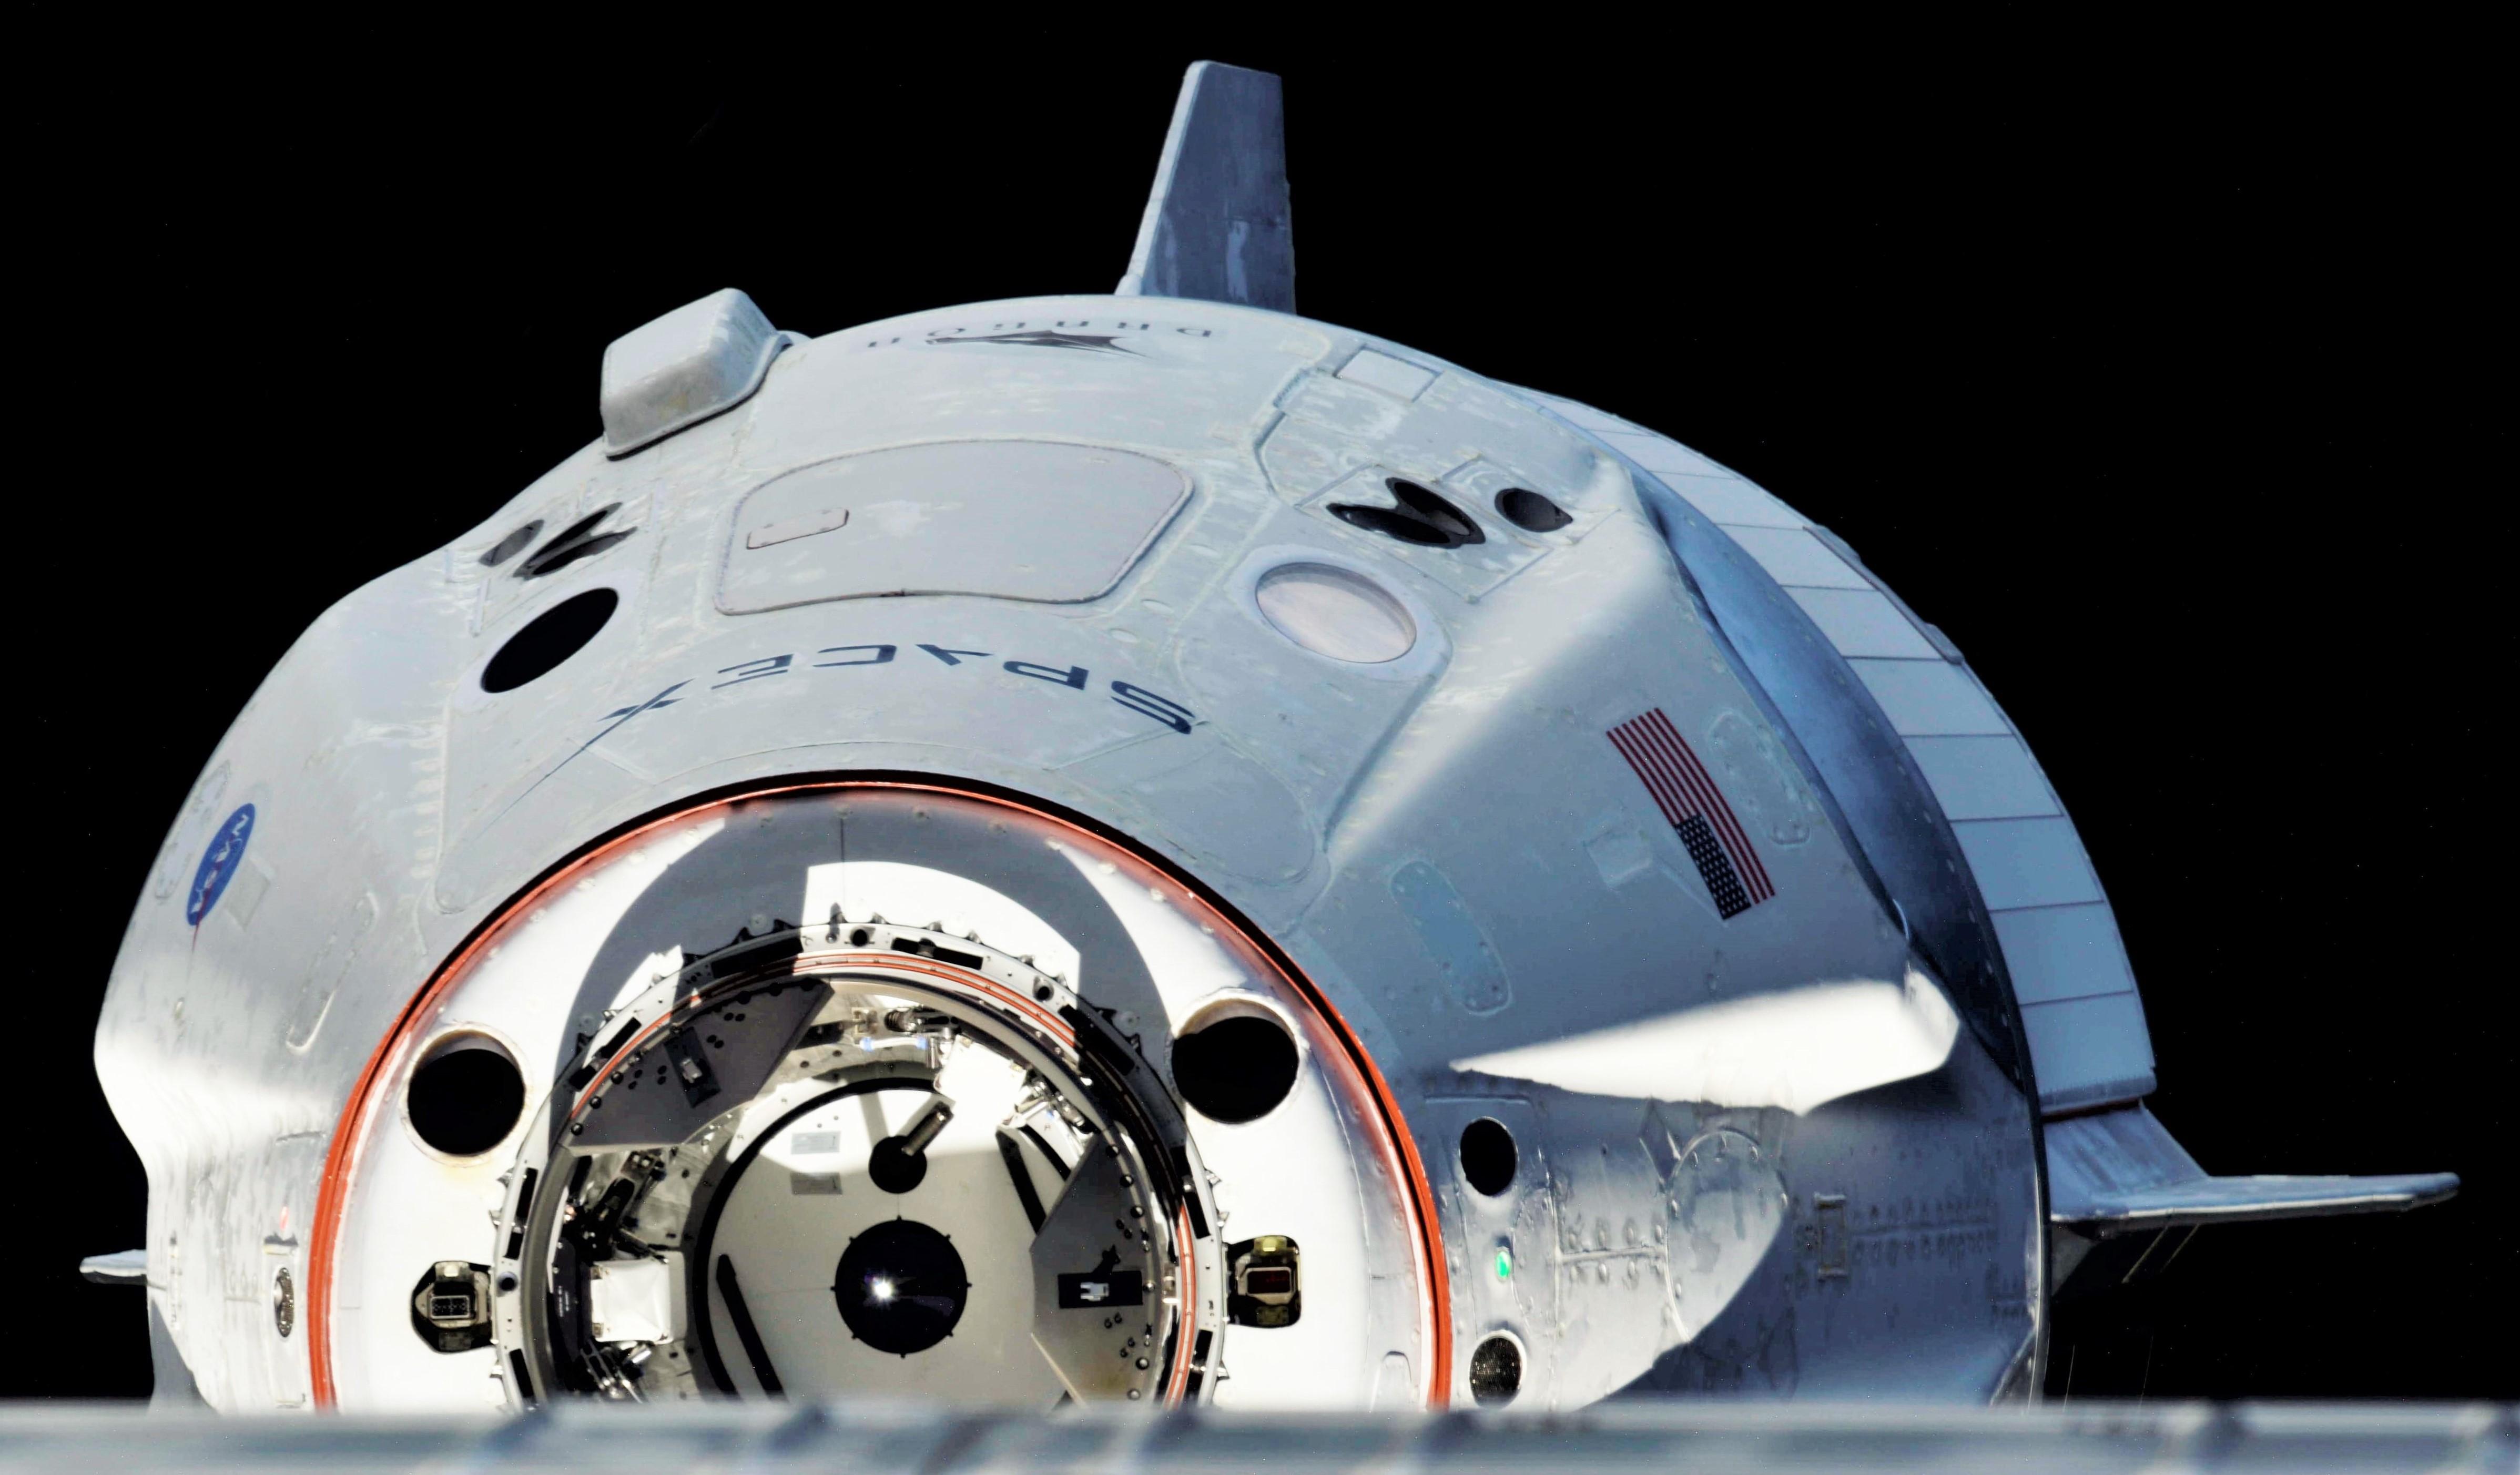 Crew Dragon DM-1 ISS arrival 030319 (Oleg Kononenko) 2 edit 2